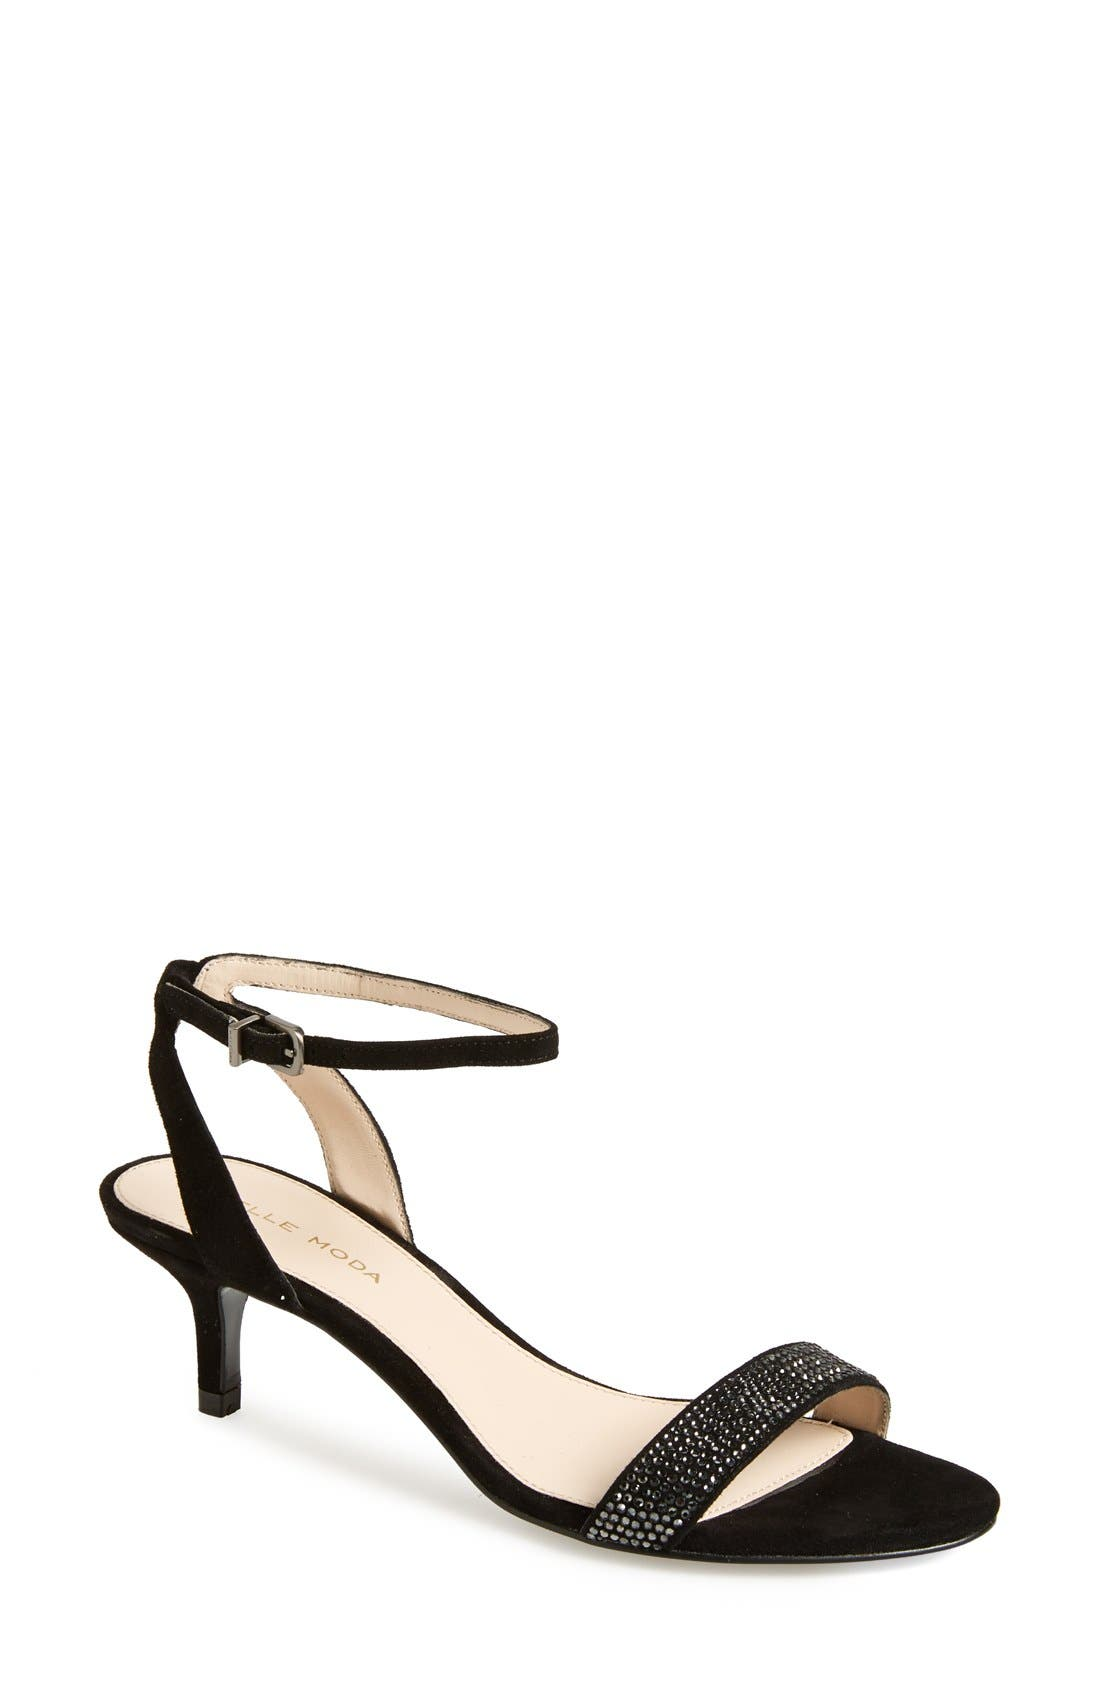 Main Image - Pelle Moda 'Fabia' Sandal (Women)